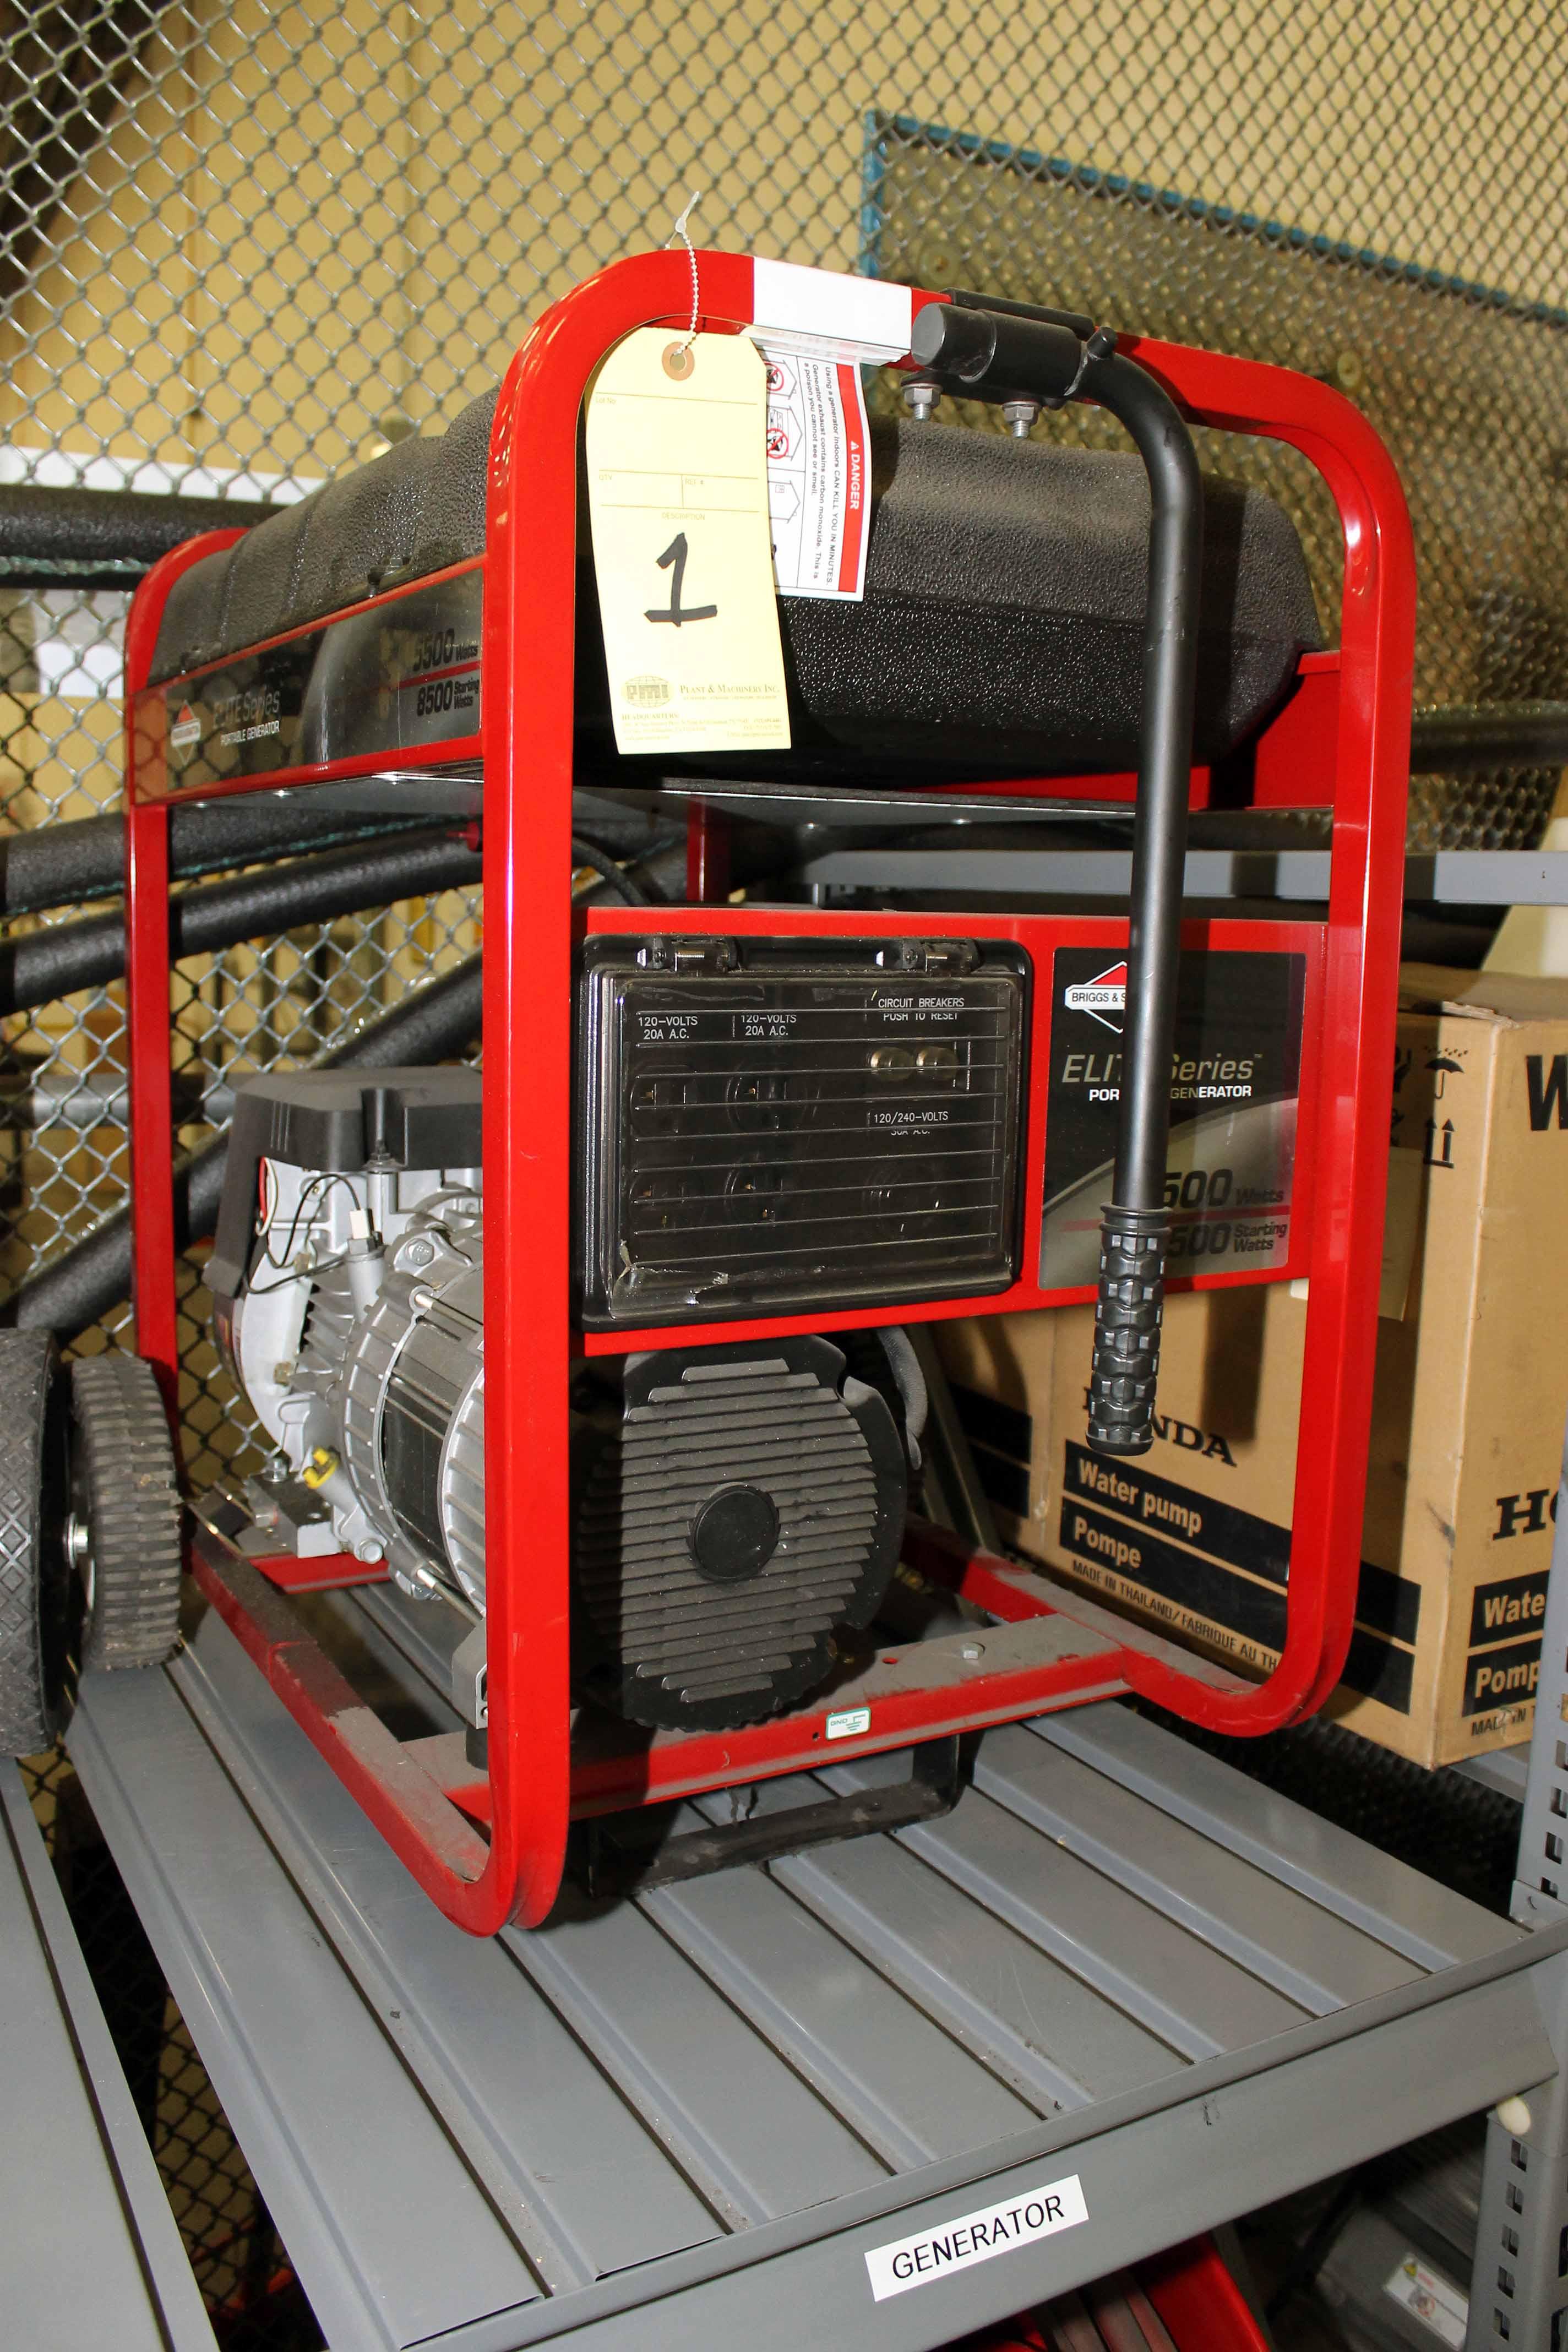 Lot 1 - PORTABLE GENERATOR, ELITE SERIES, 5,500 watt, gasoline pwrd. (Location 1 - Techway)